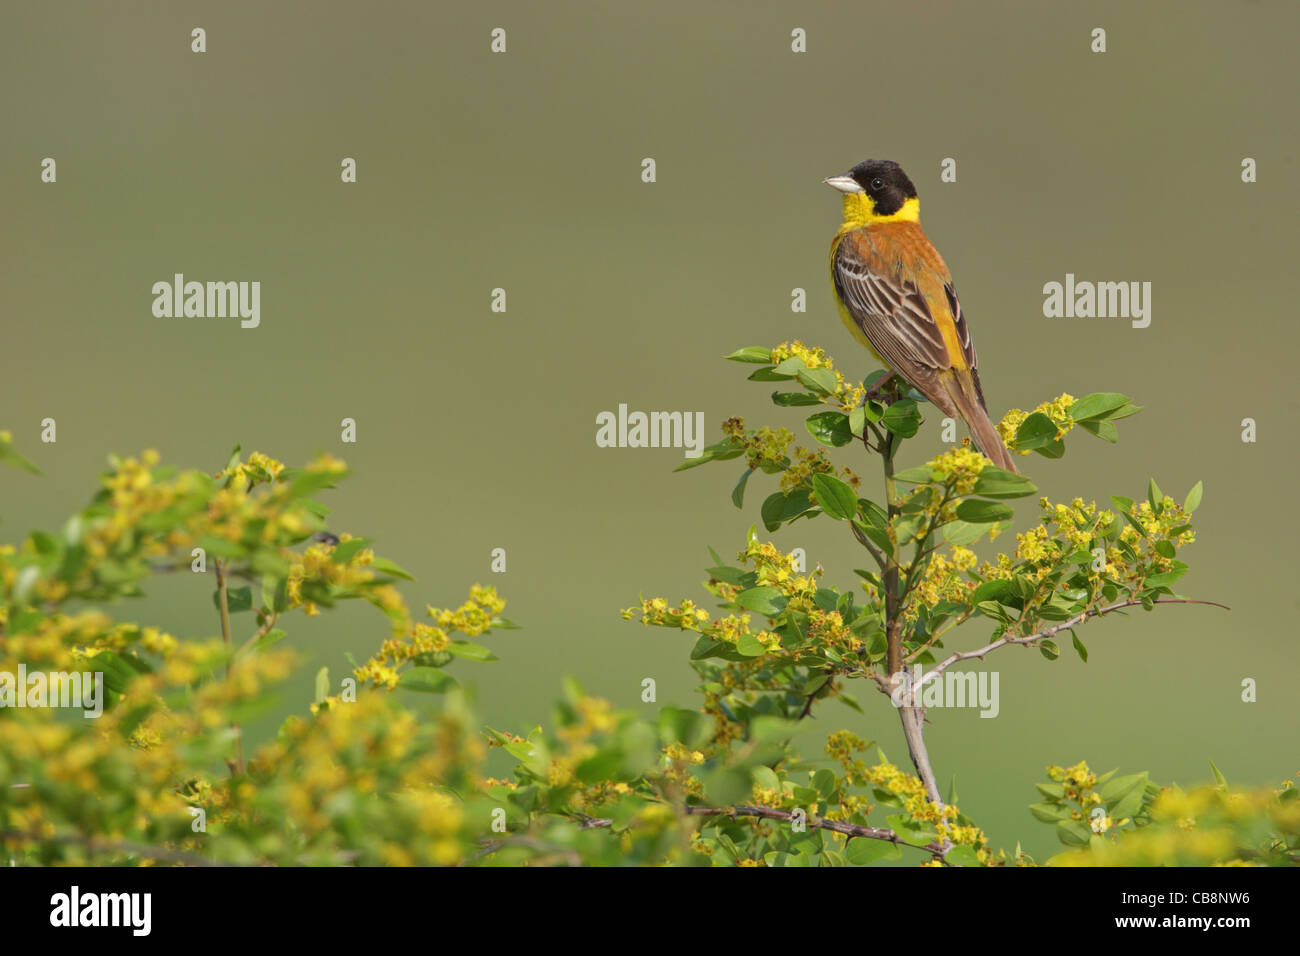 Black-headed Bunting /Emberiza melanocephala/, finches, Fringillidae, male, Bulgaria Stock Photo